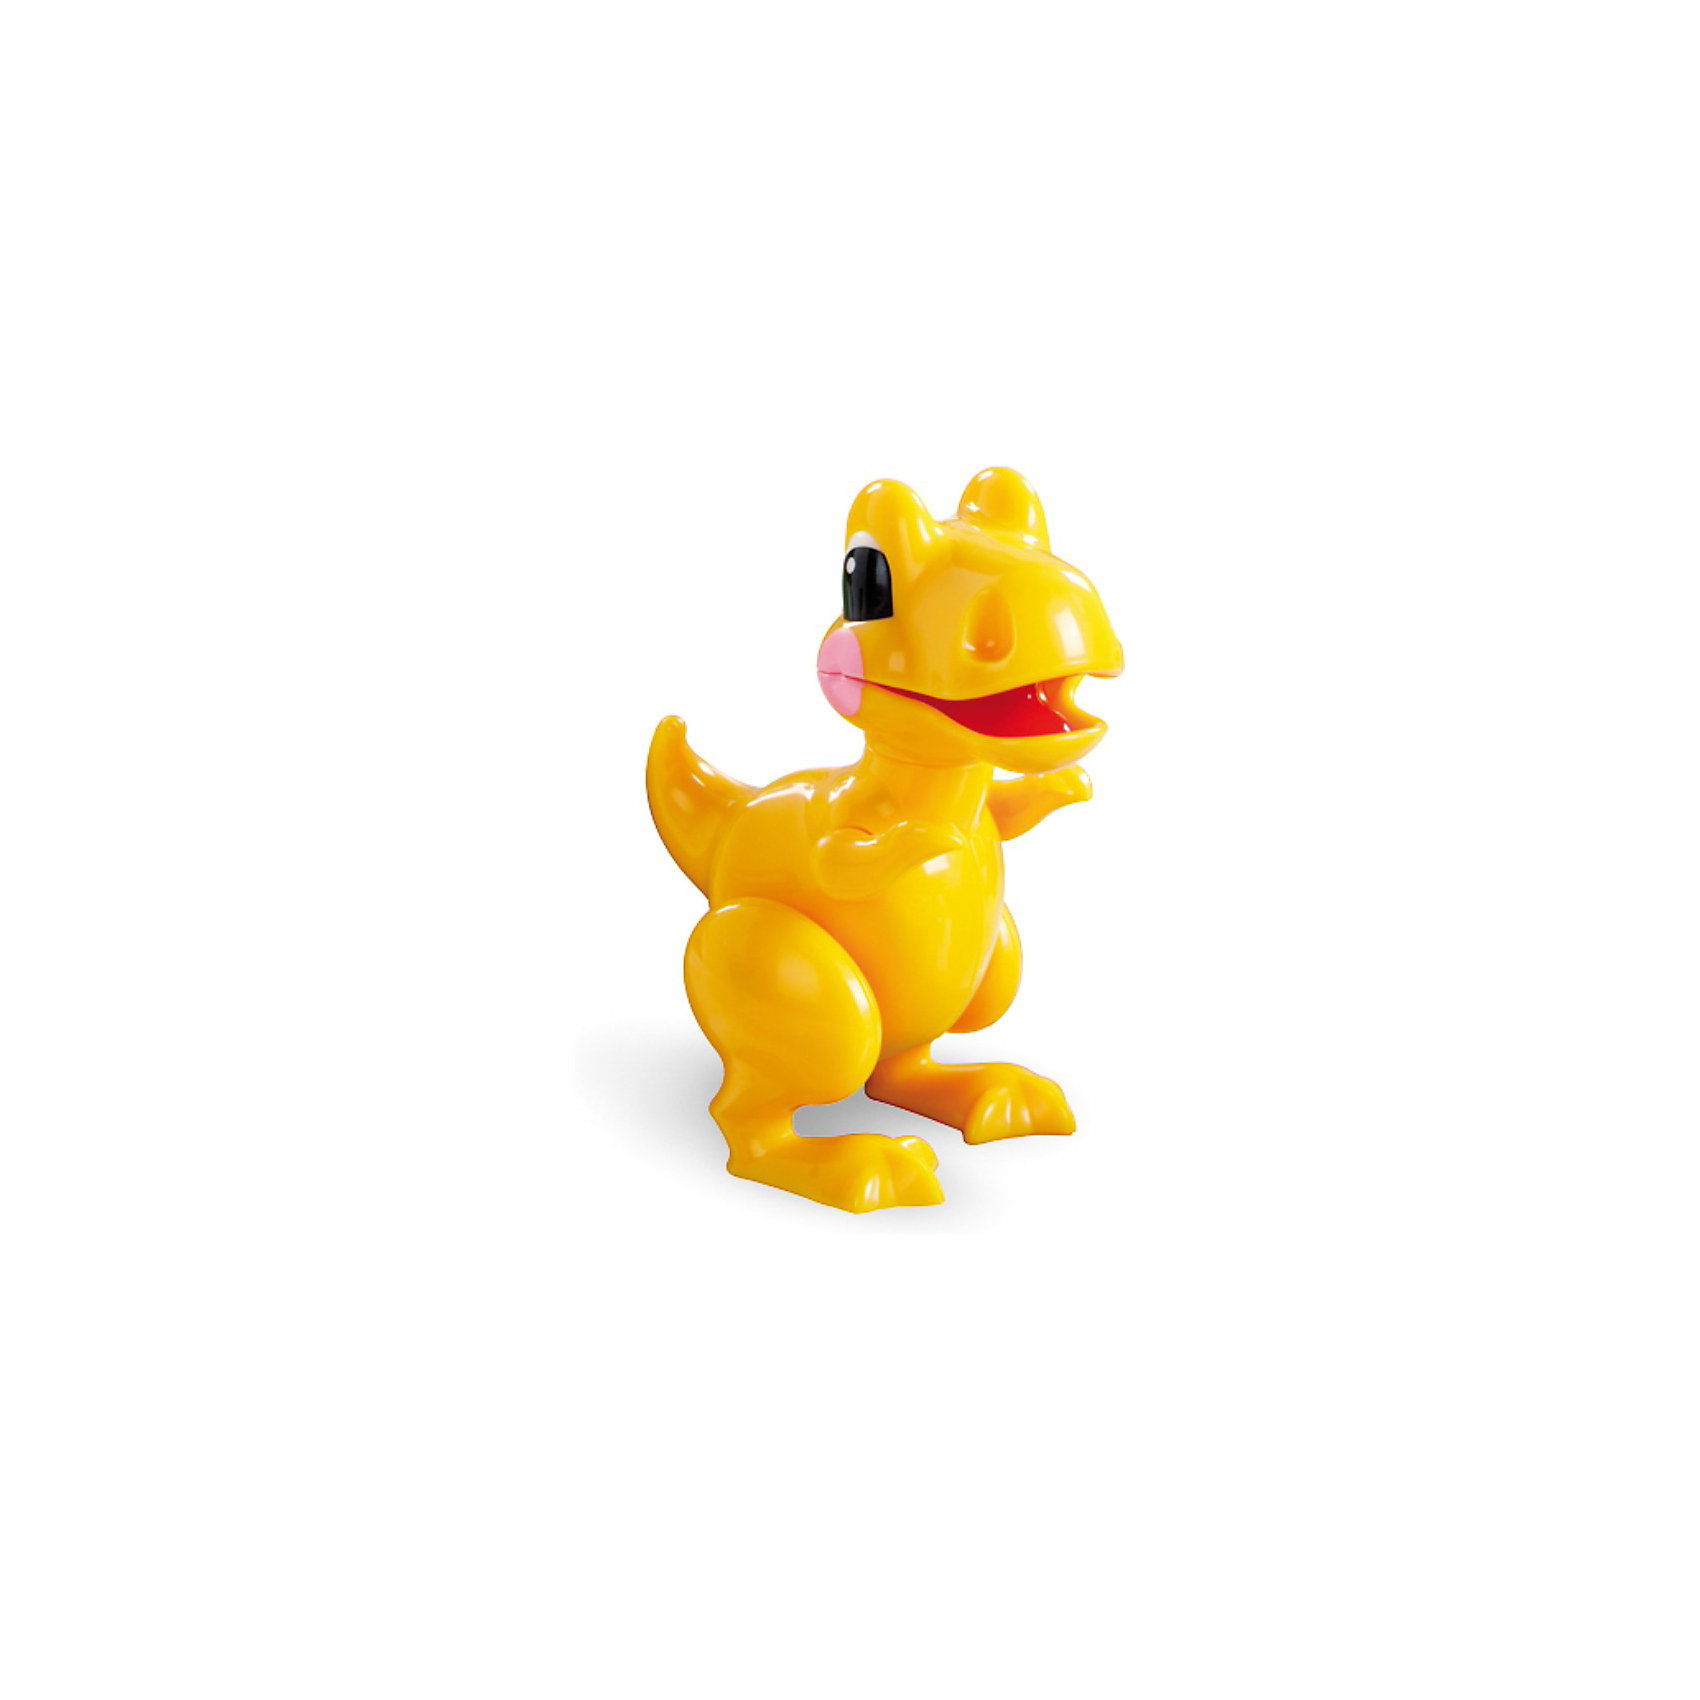 TOLO Фигурка Тираннозавр, Первые друзья, TOLO фигурки игрушки tolo фигурка пещерная девочка